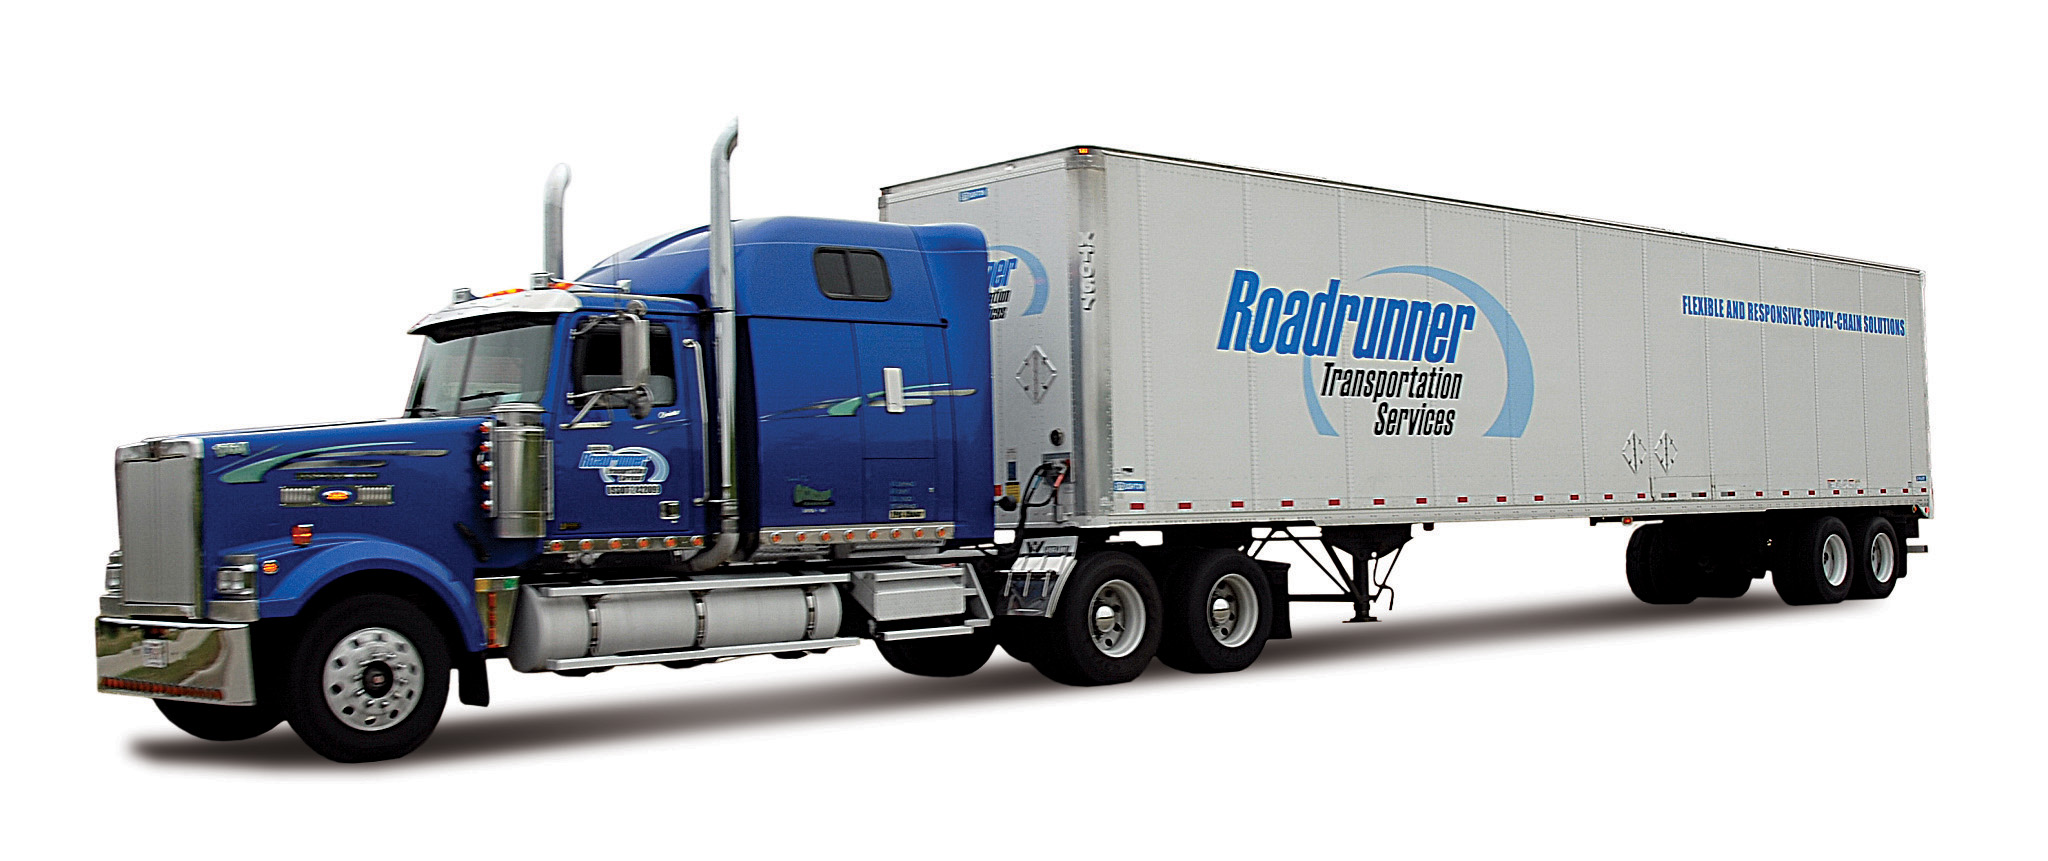 Roadrunner Transportation Profit Inches Higher